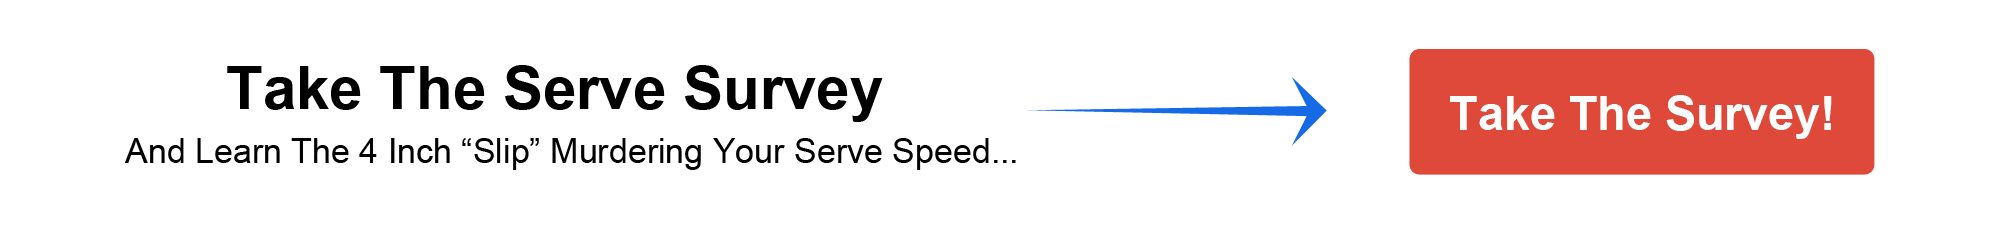 02_serve-survey_horizontal-banner